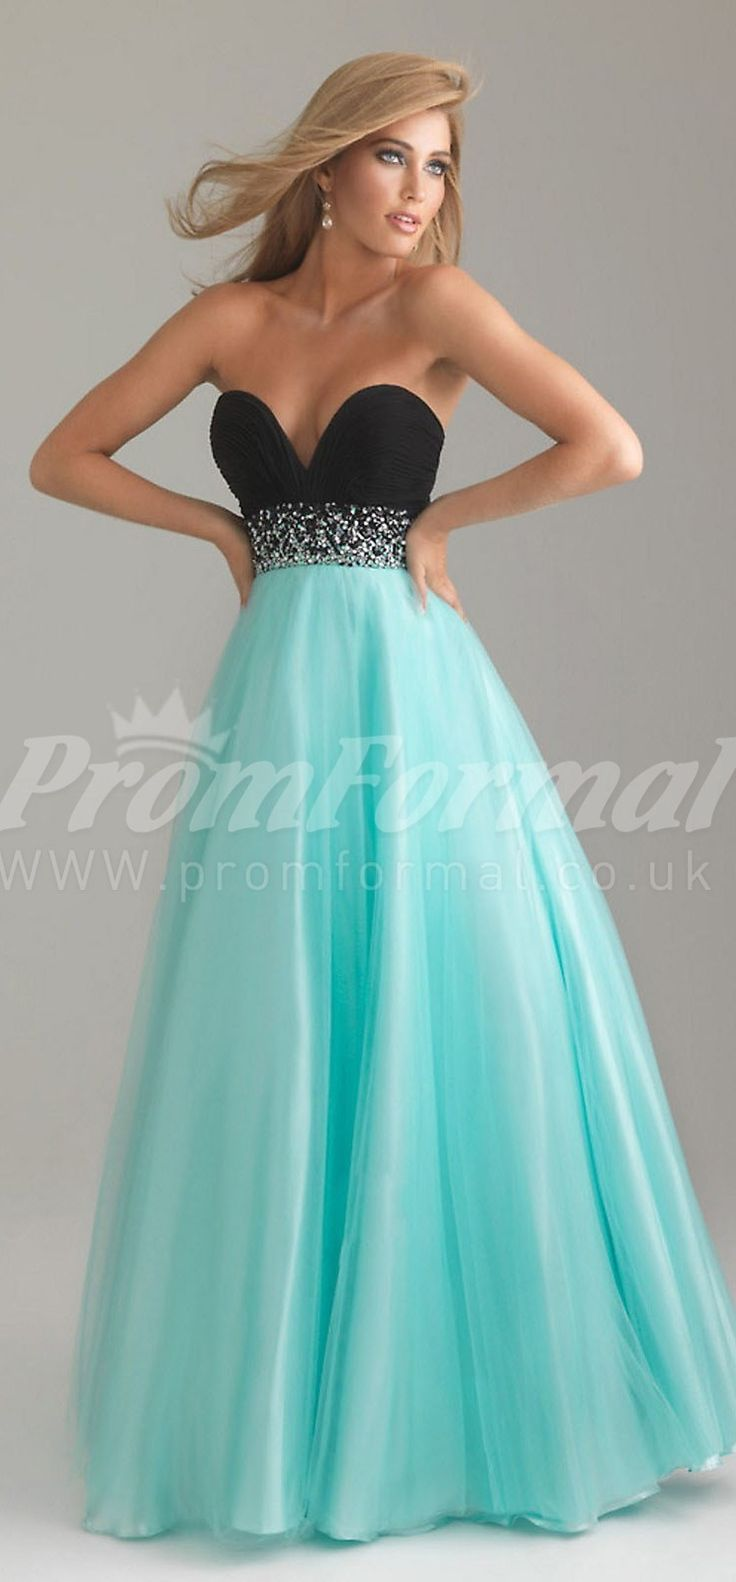 440 best PROM! images on Pinterest | Ballroom dress, Cute dresses ...